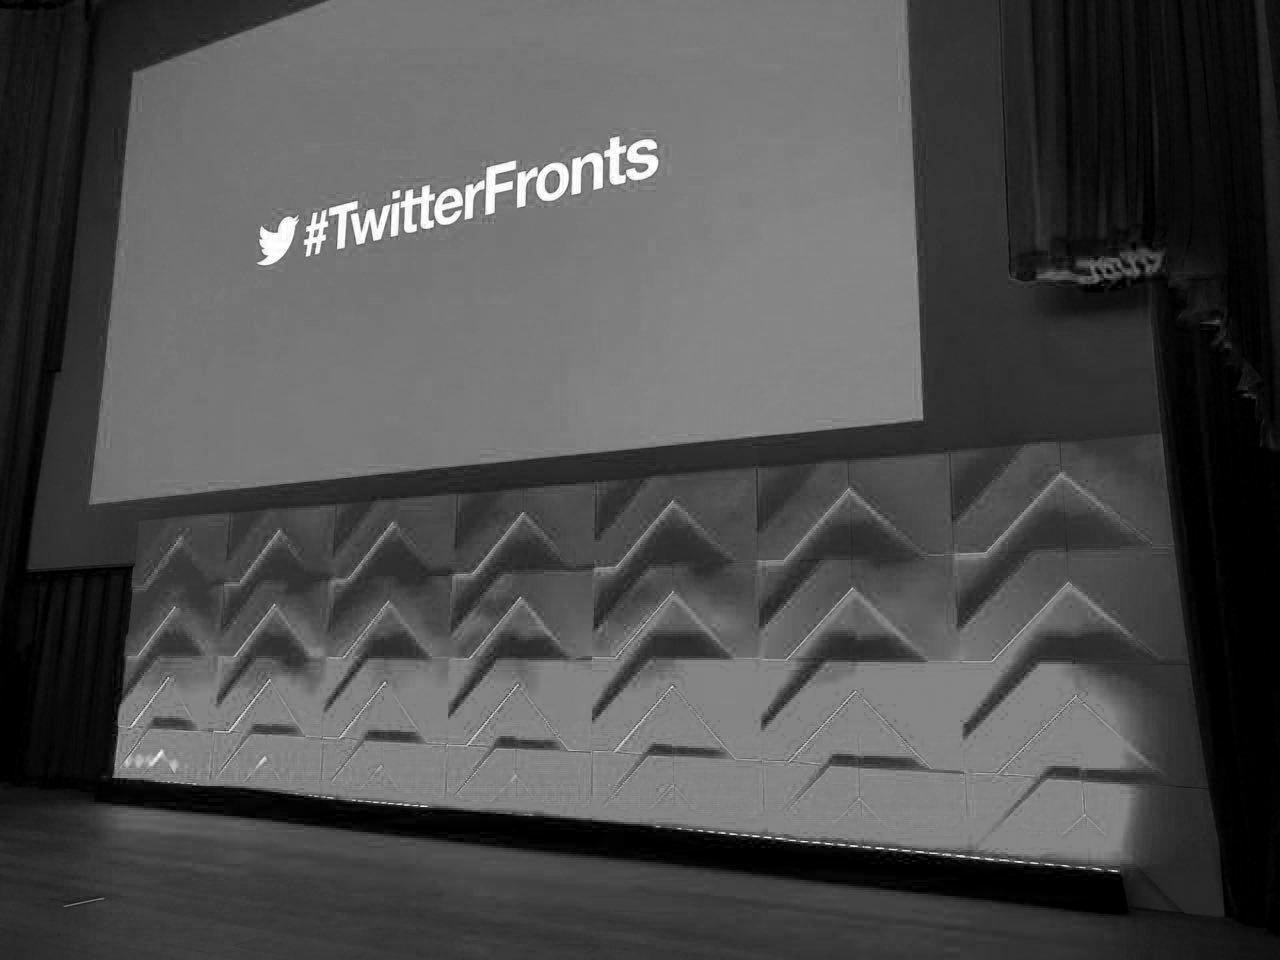 twitterfronts stage.jpg